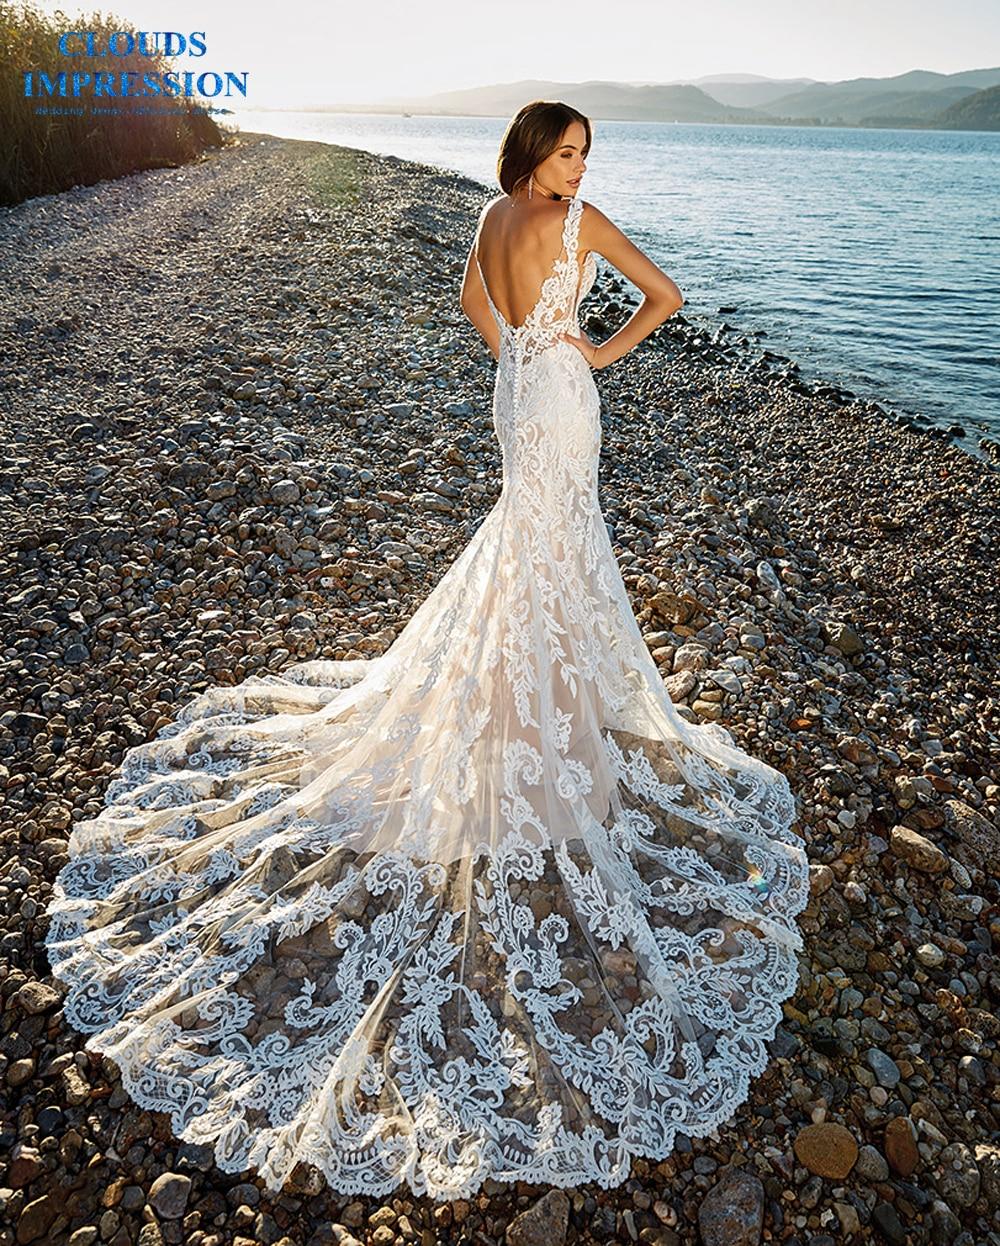 Romantic Chapel Train Mermaid Wedding Dress 2019 V-neck Beading Beach Lace Bride Dress Vestige De Noiva